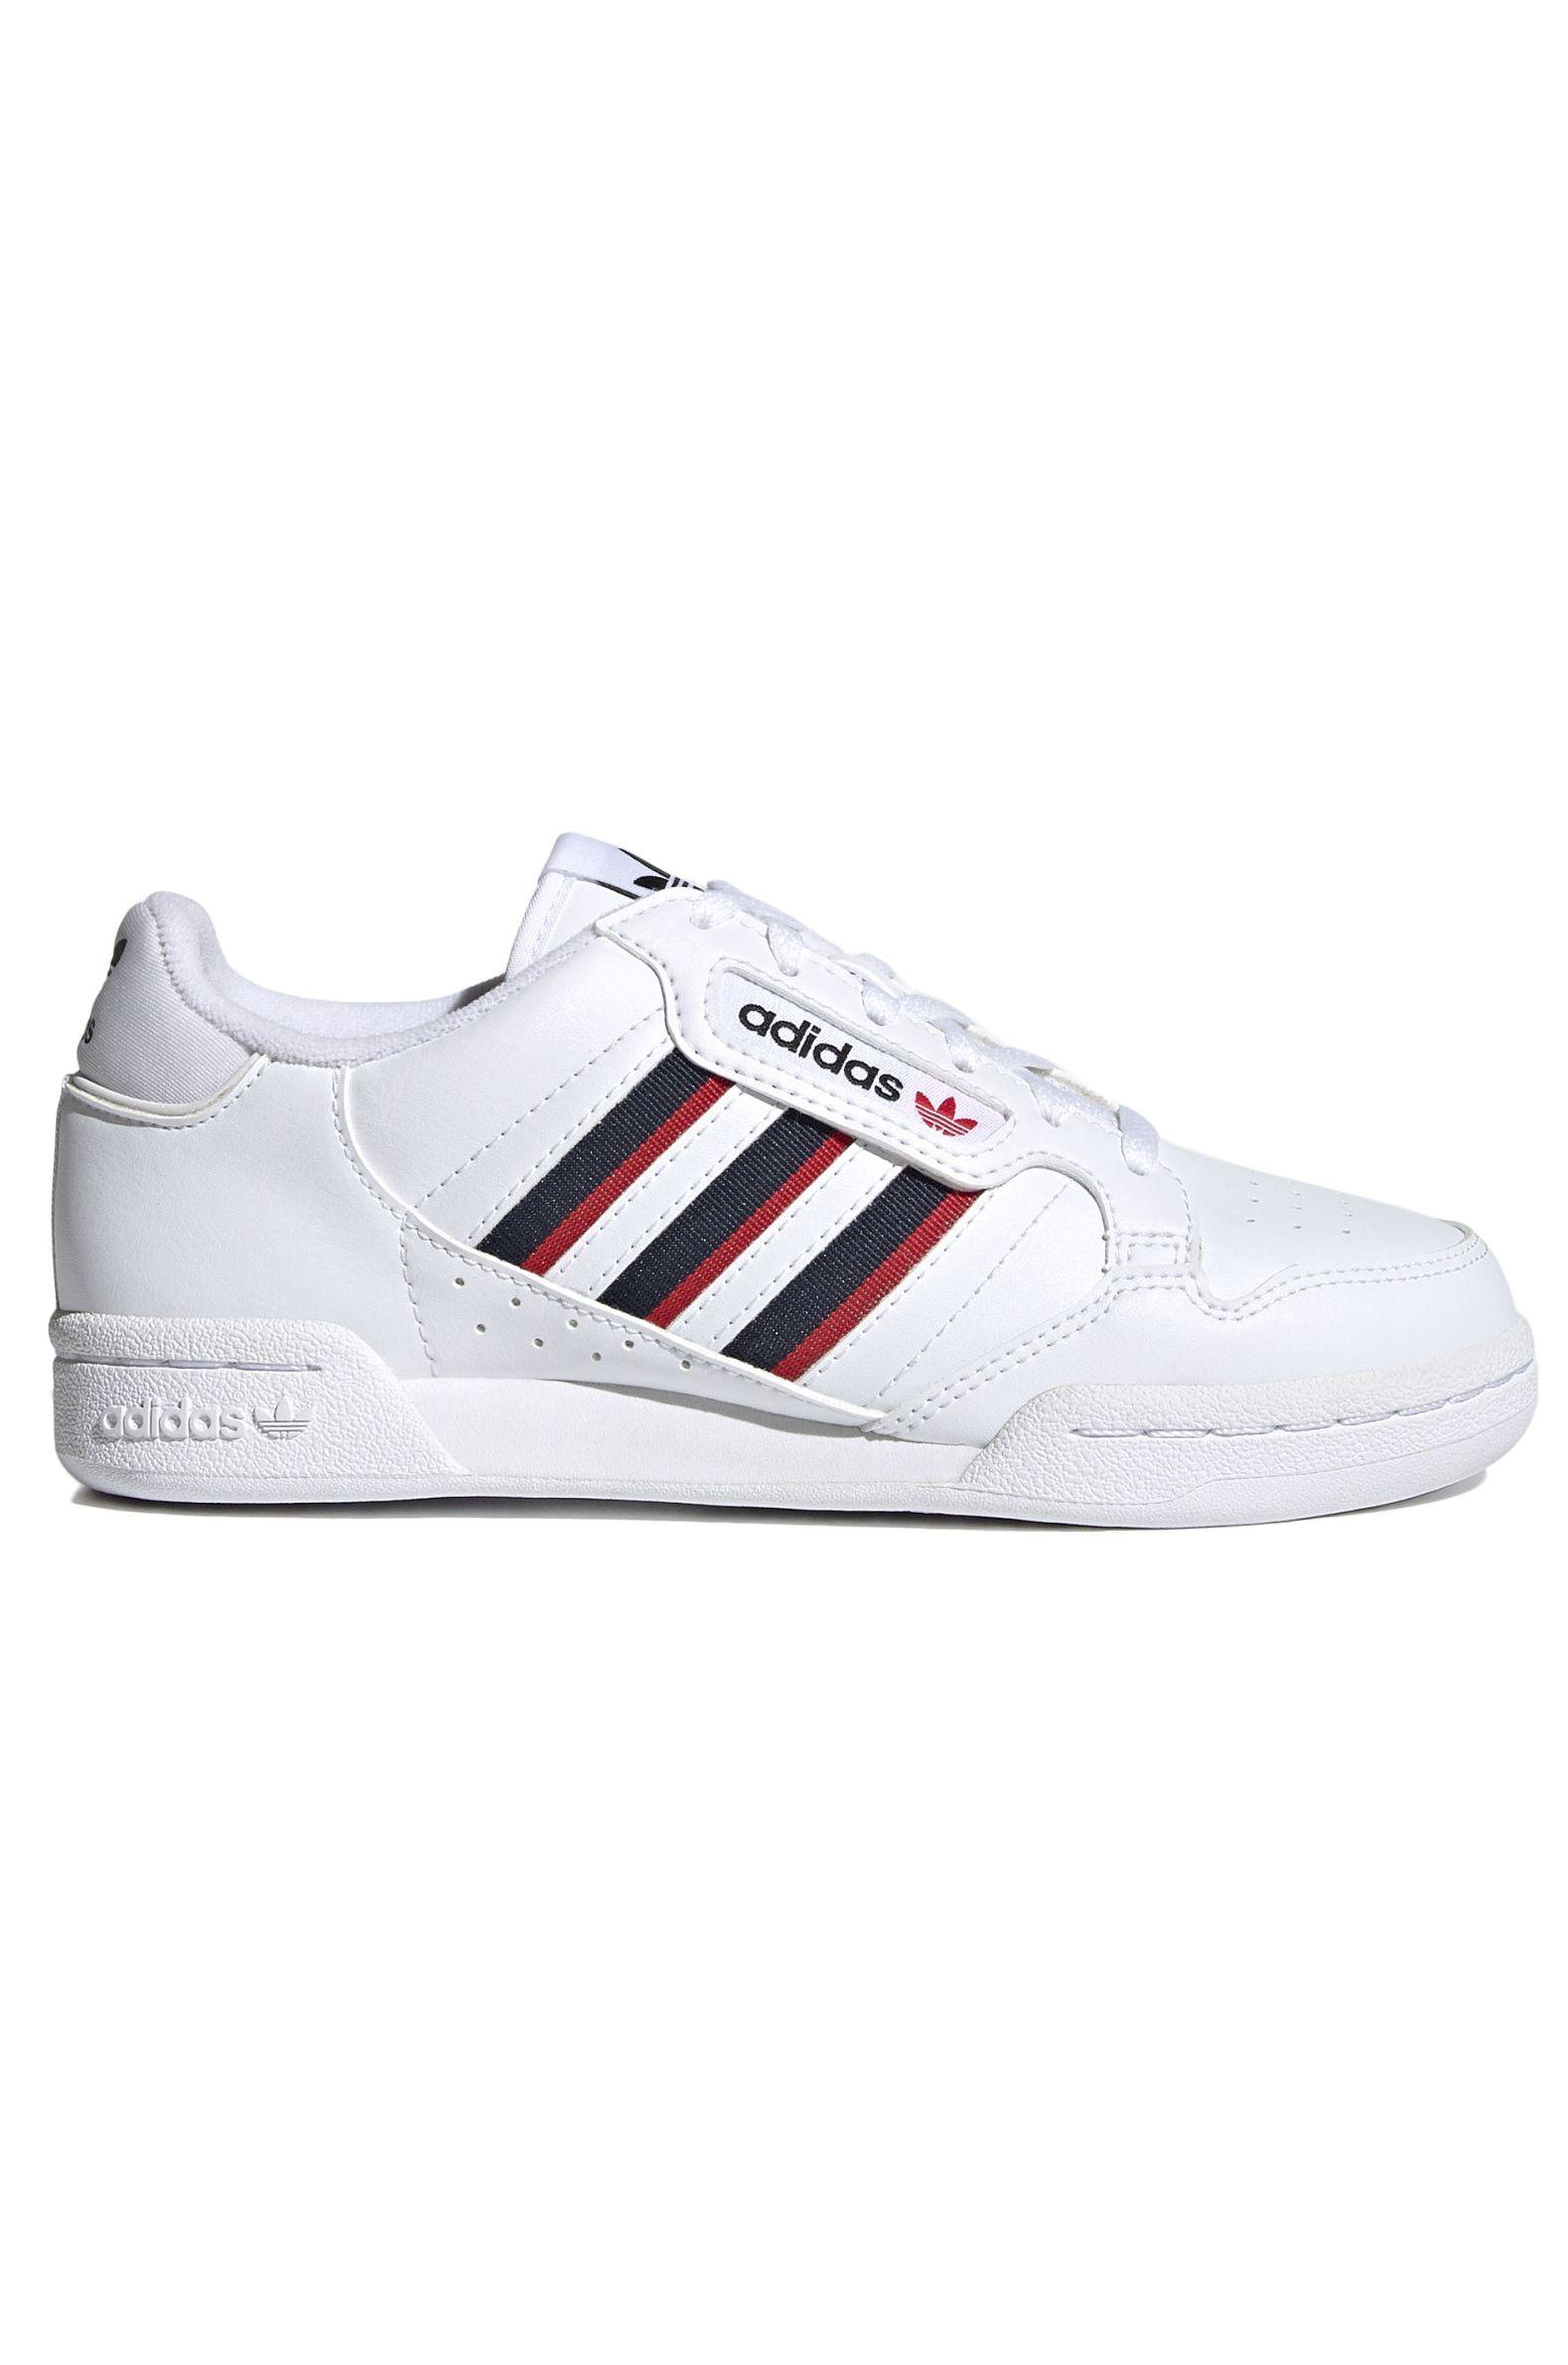 Adidas Shoes CONTINENTAL 80 STRIP Ftwrwhite